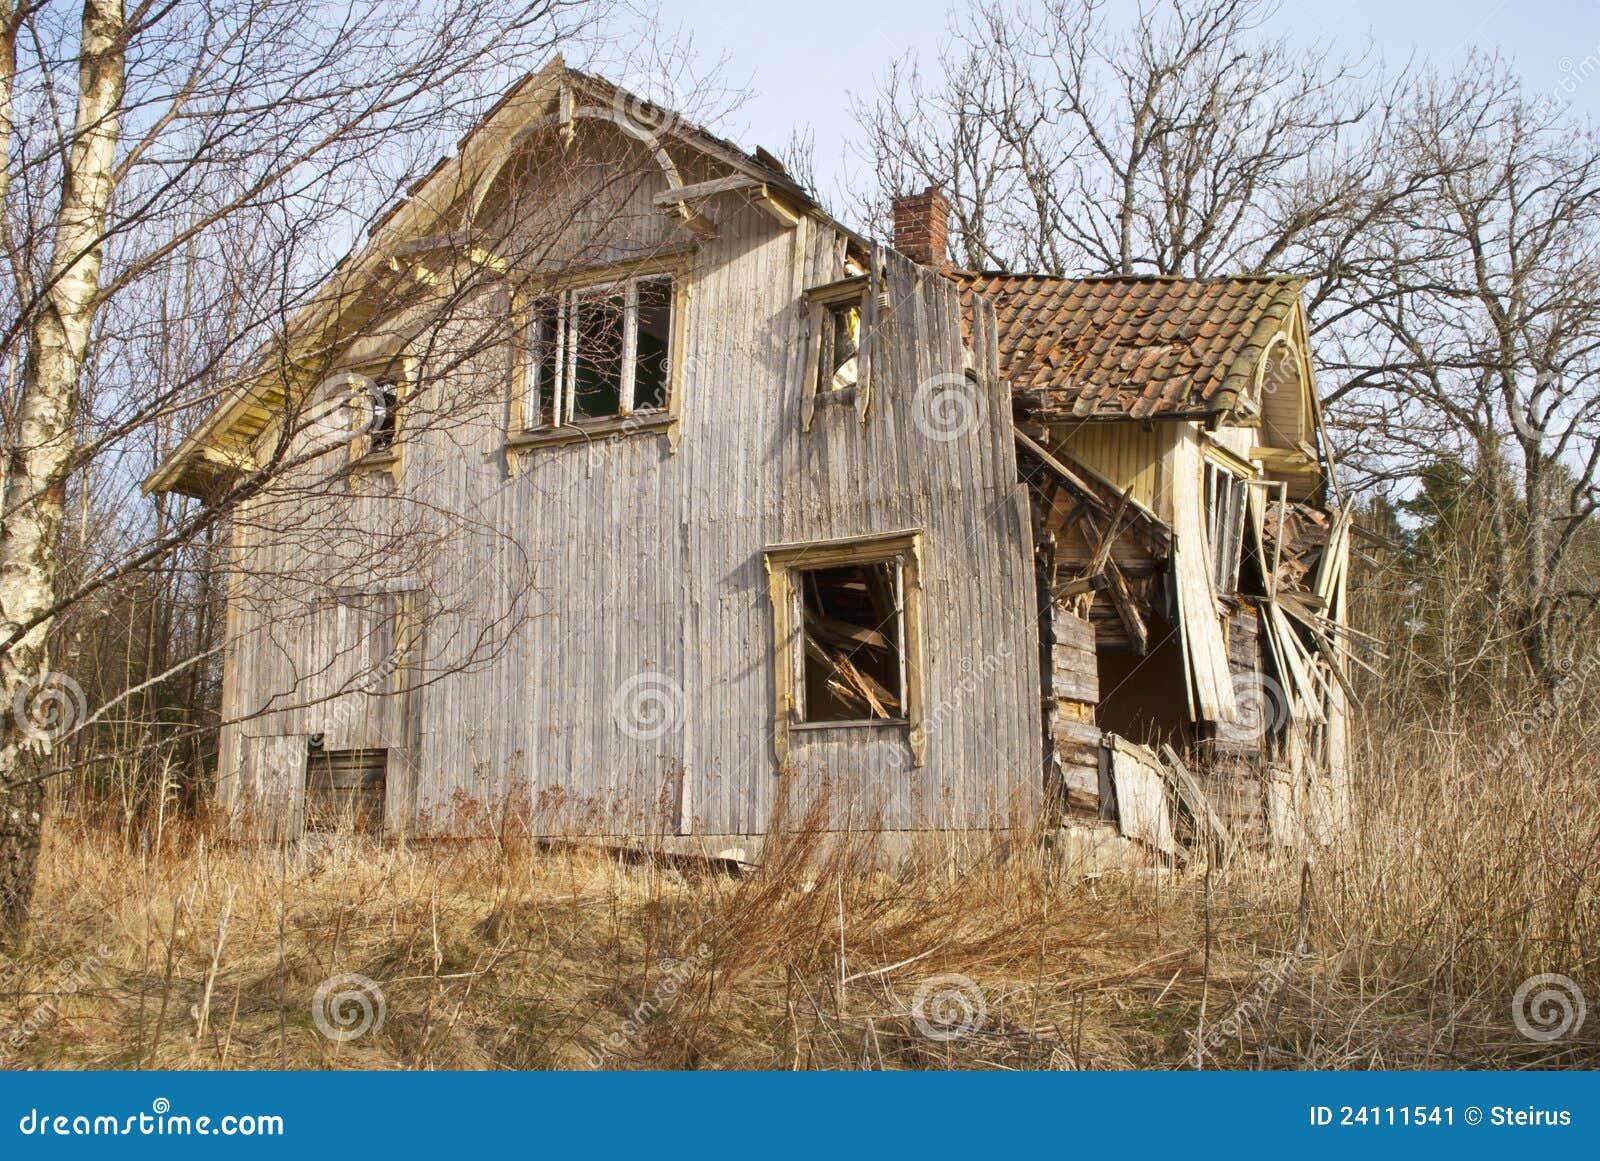 verfallenes haus haupteingang stockbild bild 24111541. Black Bedroom Furniture Sets. Home Design Ideas